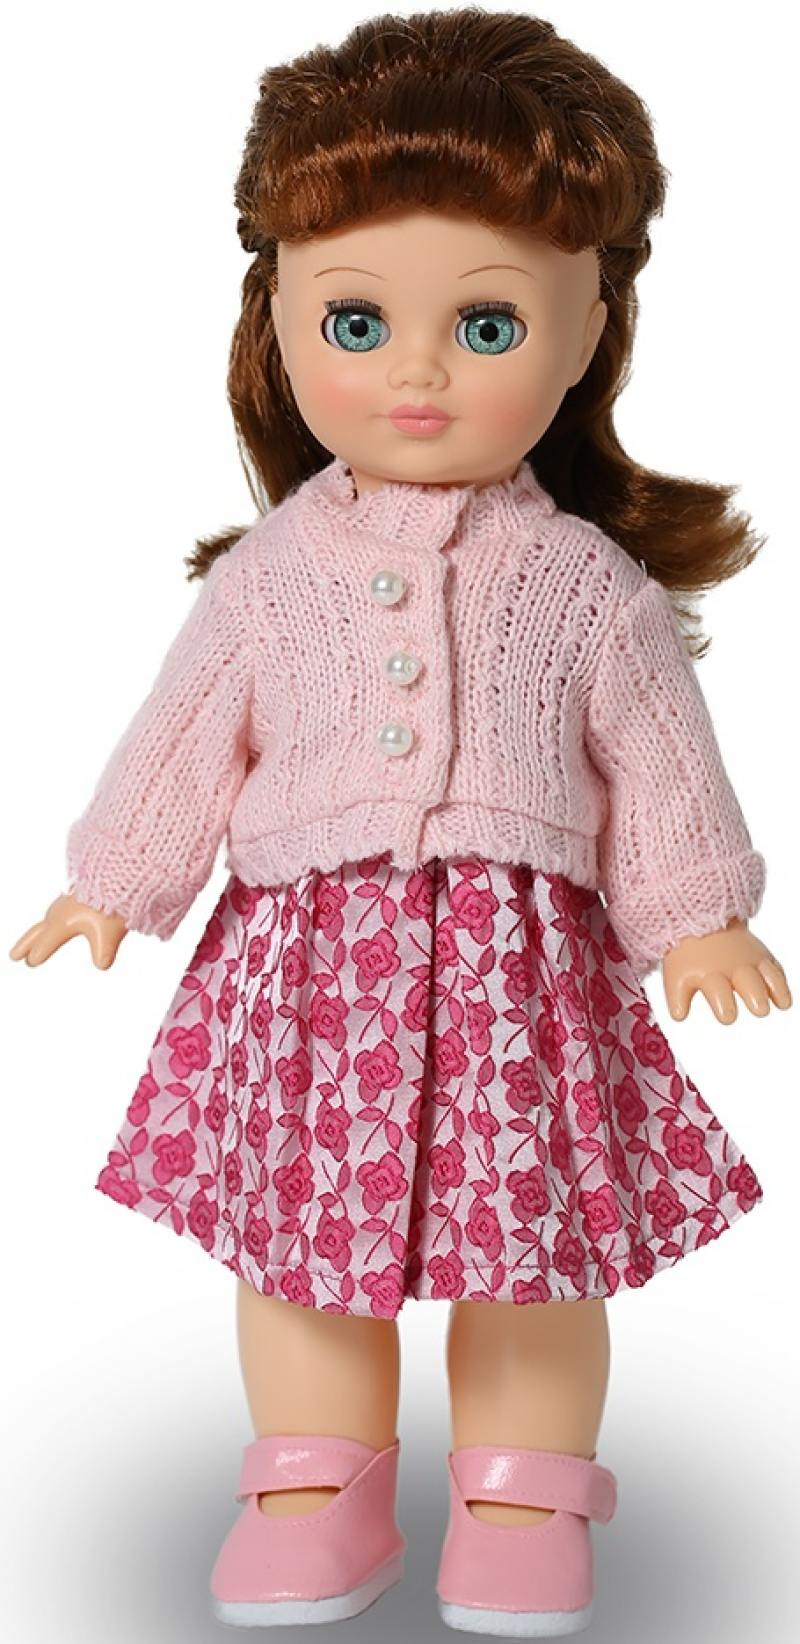 Кукла ВЕСНА Элла 1 (озвученная) baby kids girl solid dress ruffles short sleeve demin dresses cute rabbit bag outfits girls summer casual clothes